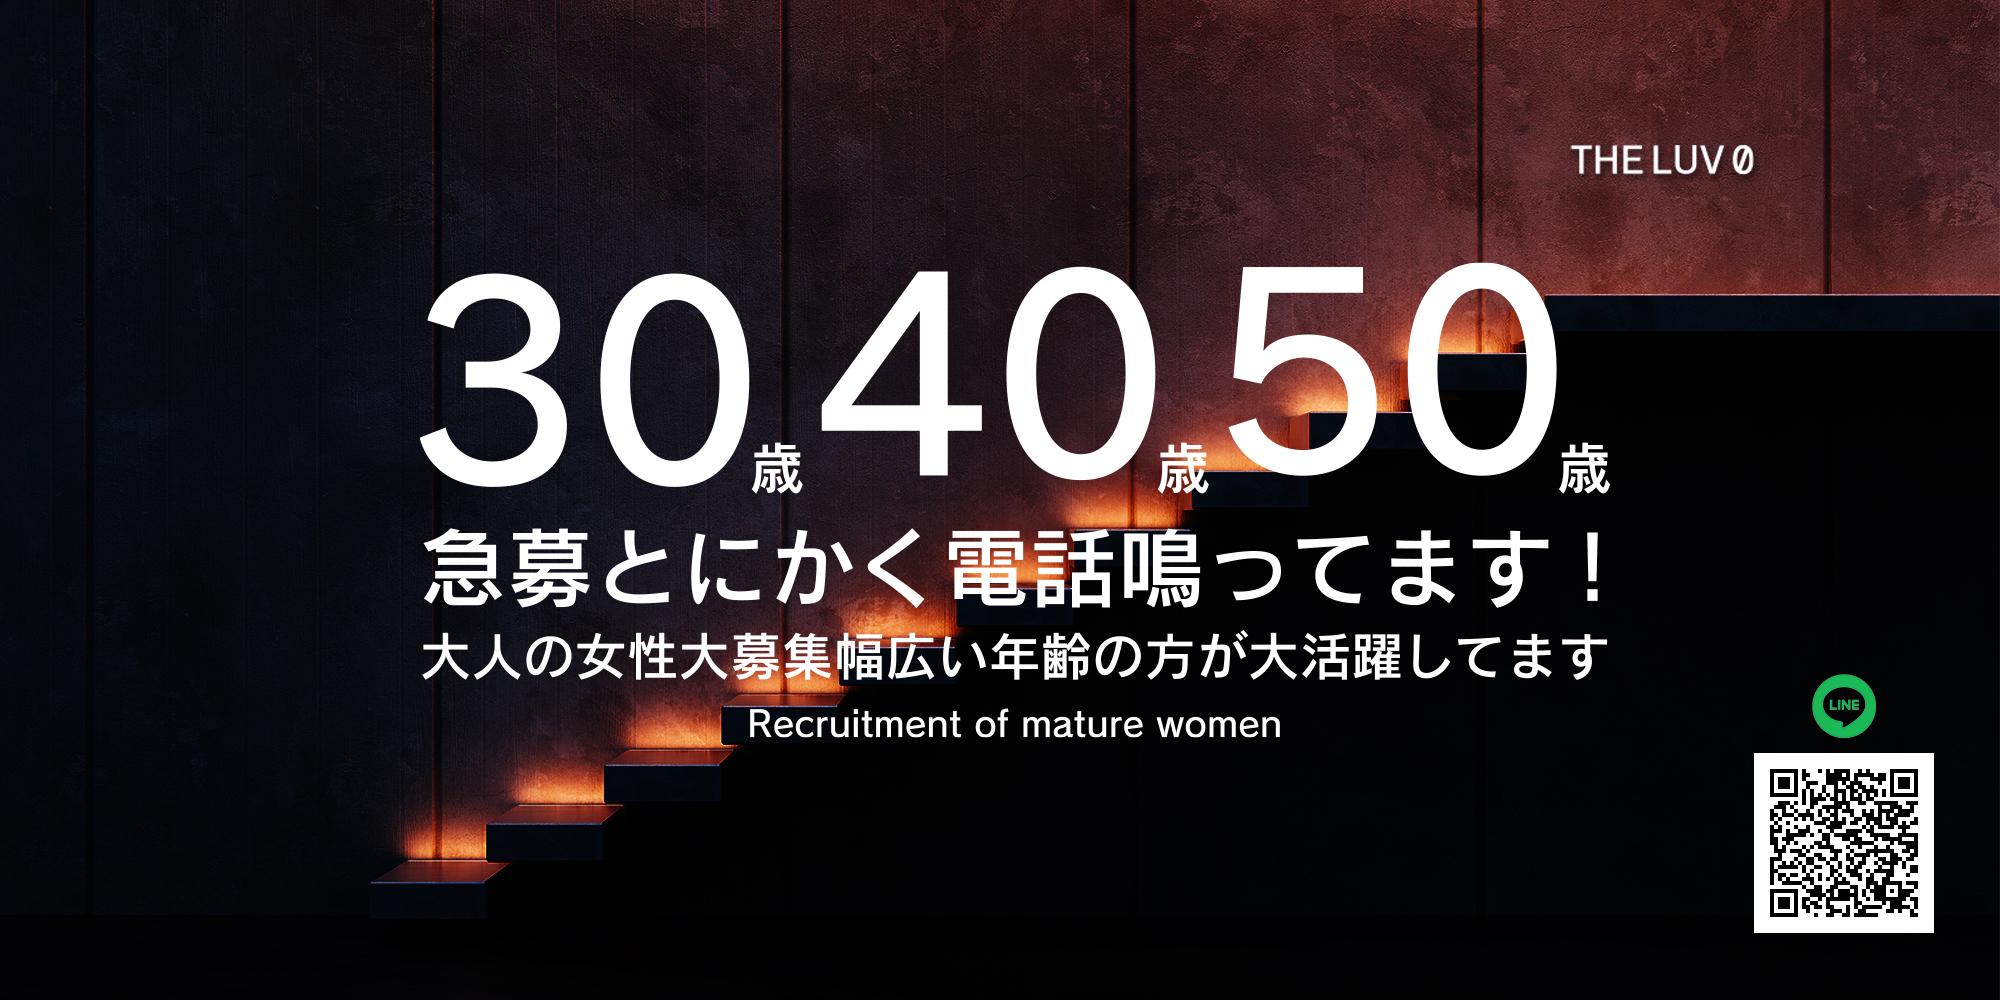 THE LUV(福岡市・博多)の一般メンズエステ(店舗型)求人・高収入バイトPR画像1